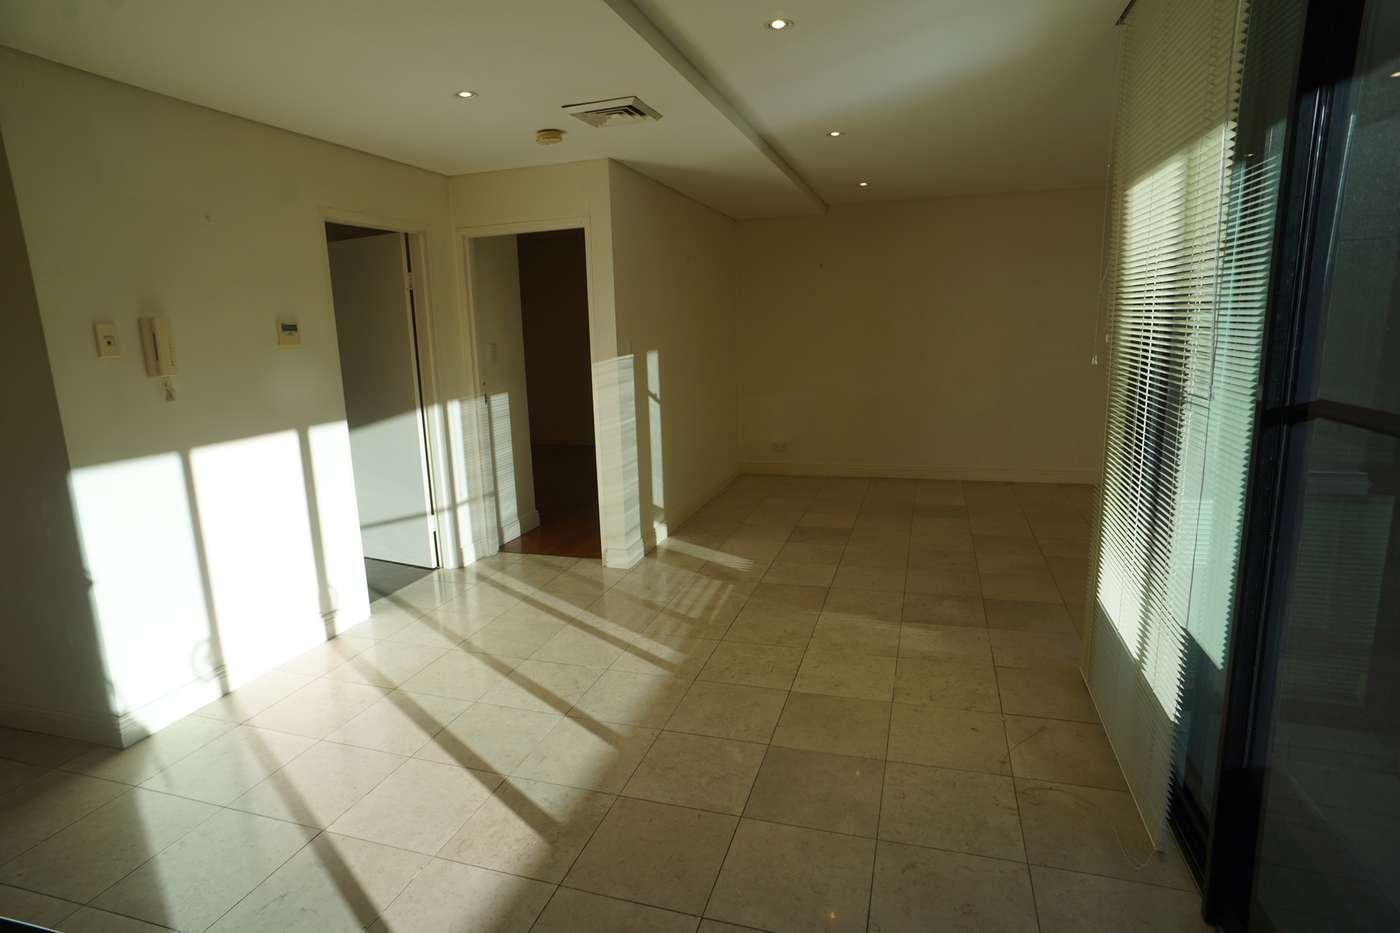 Main view of Homely apartment listing, 11/168 Bondi Road, Bondi, NSW 2026